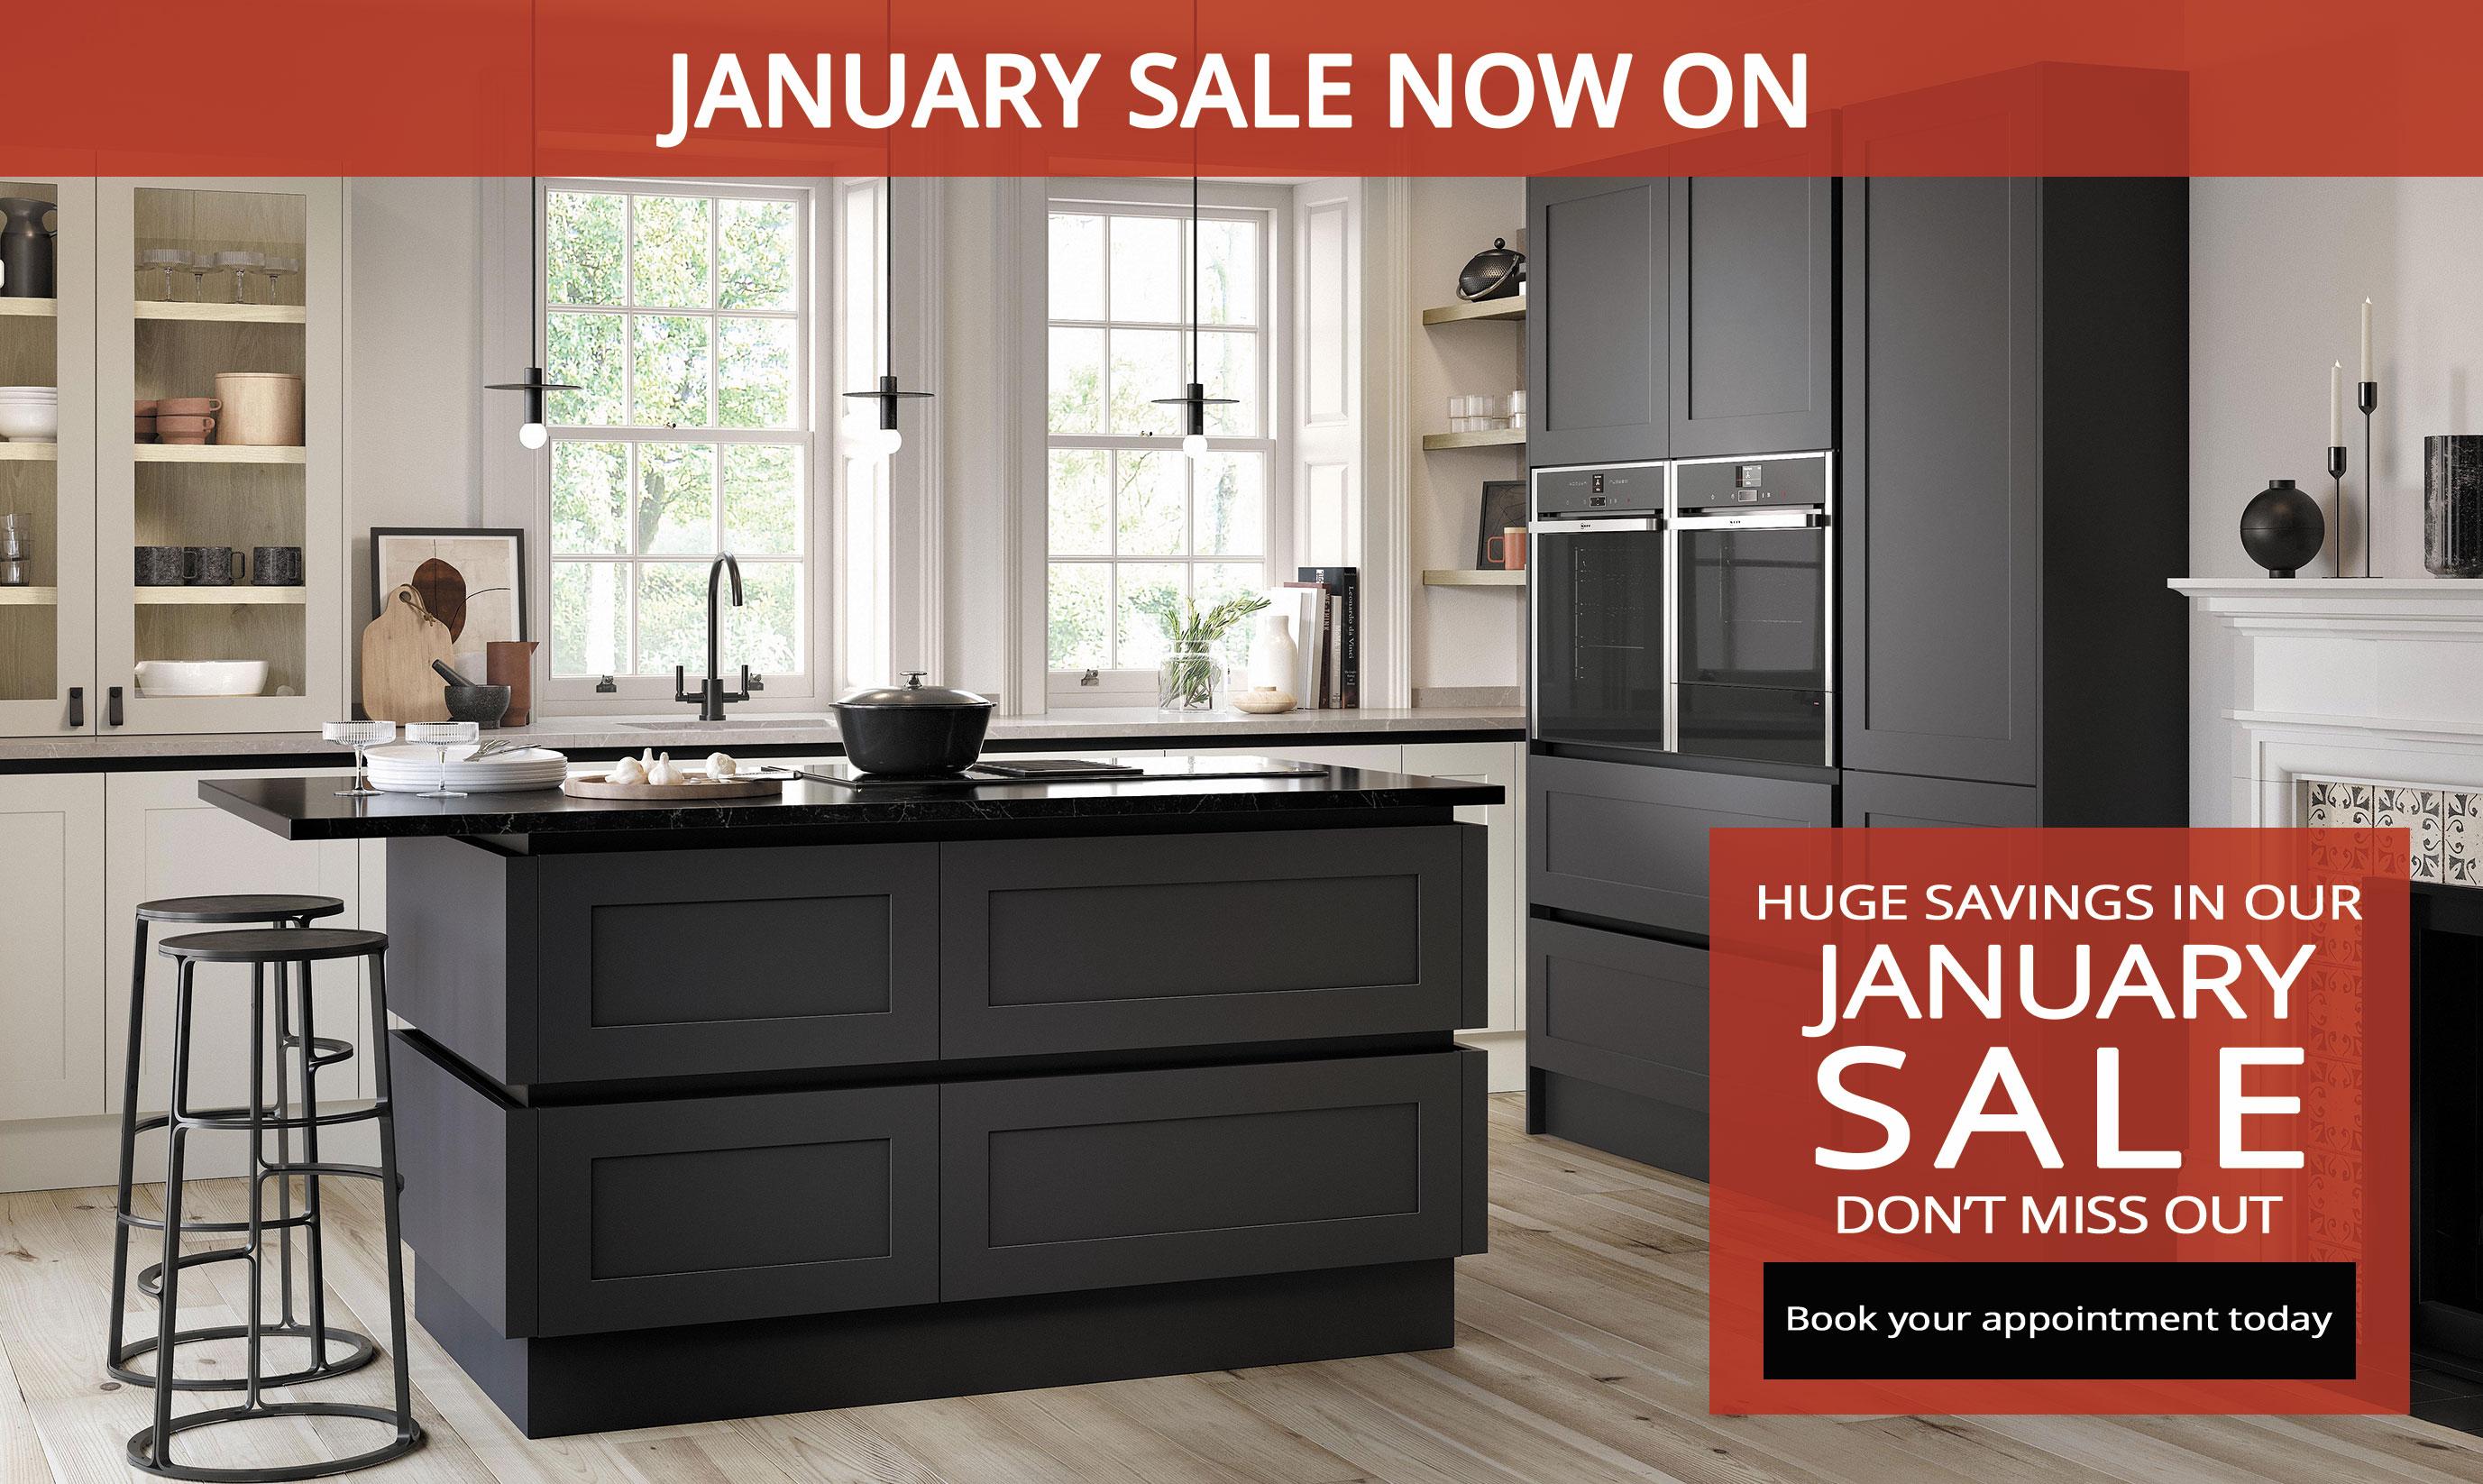 January Kitchen Sale at Kitchen Emporium